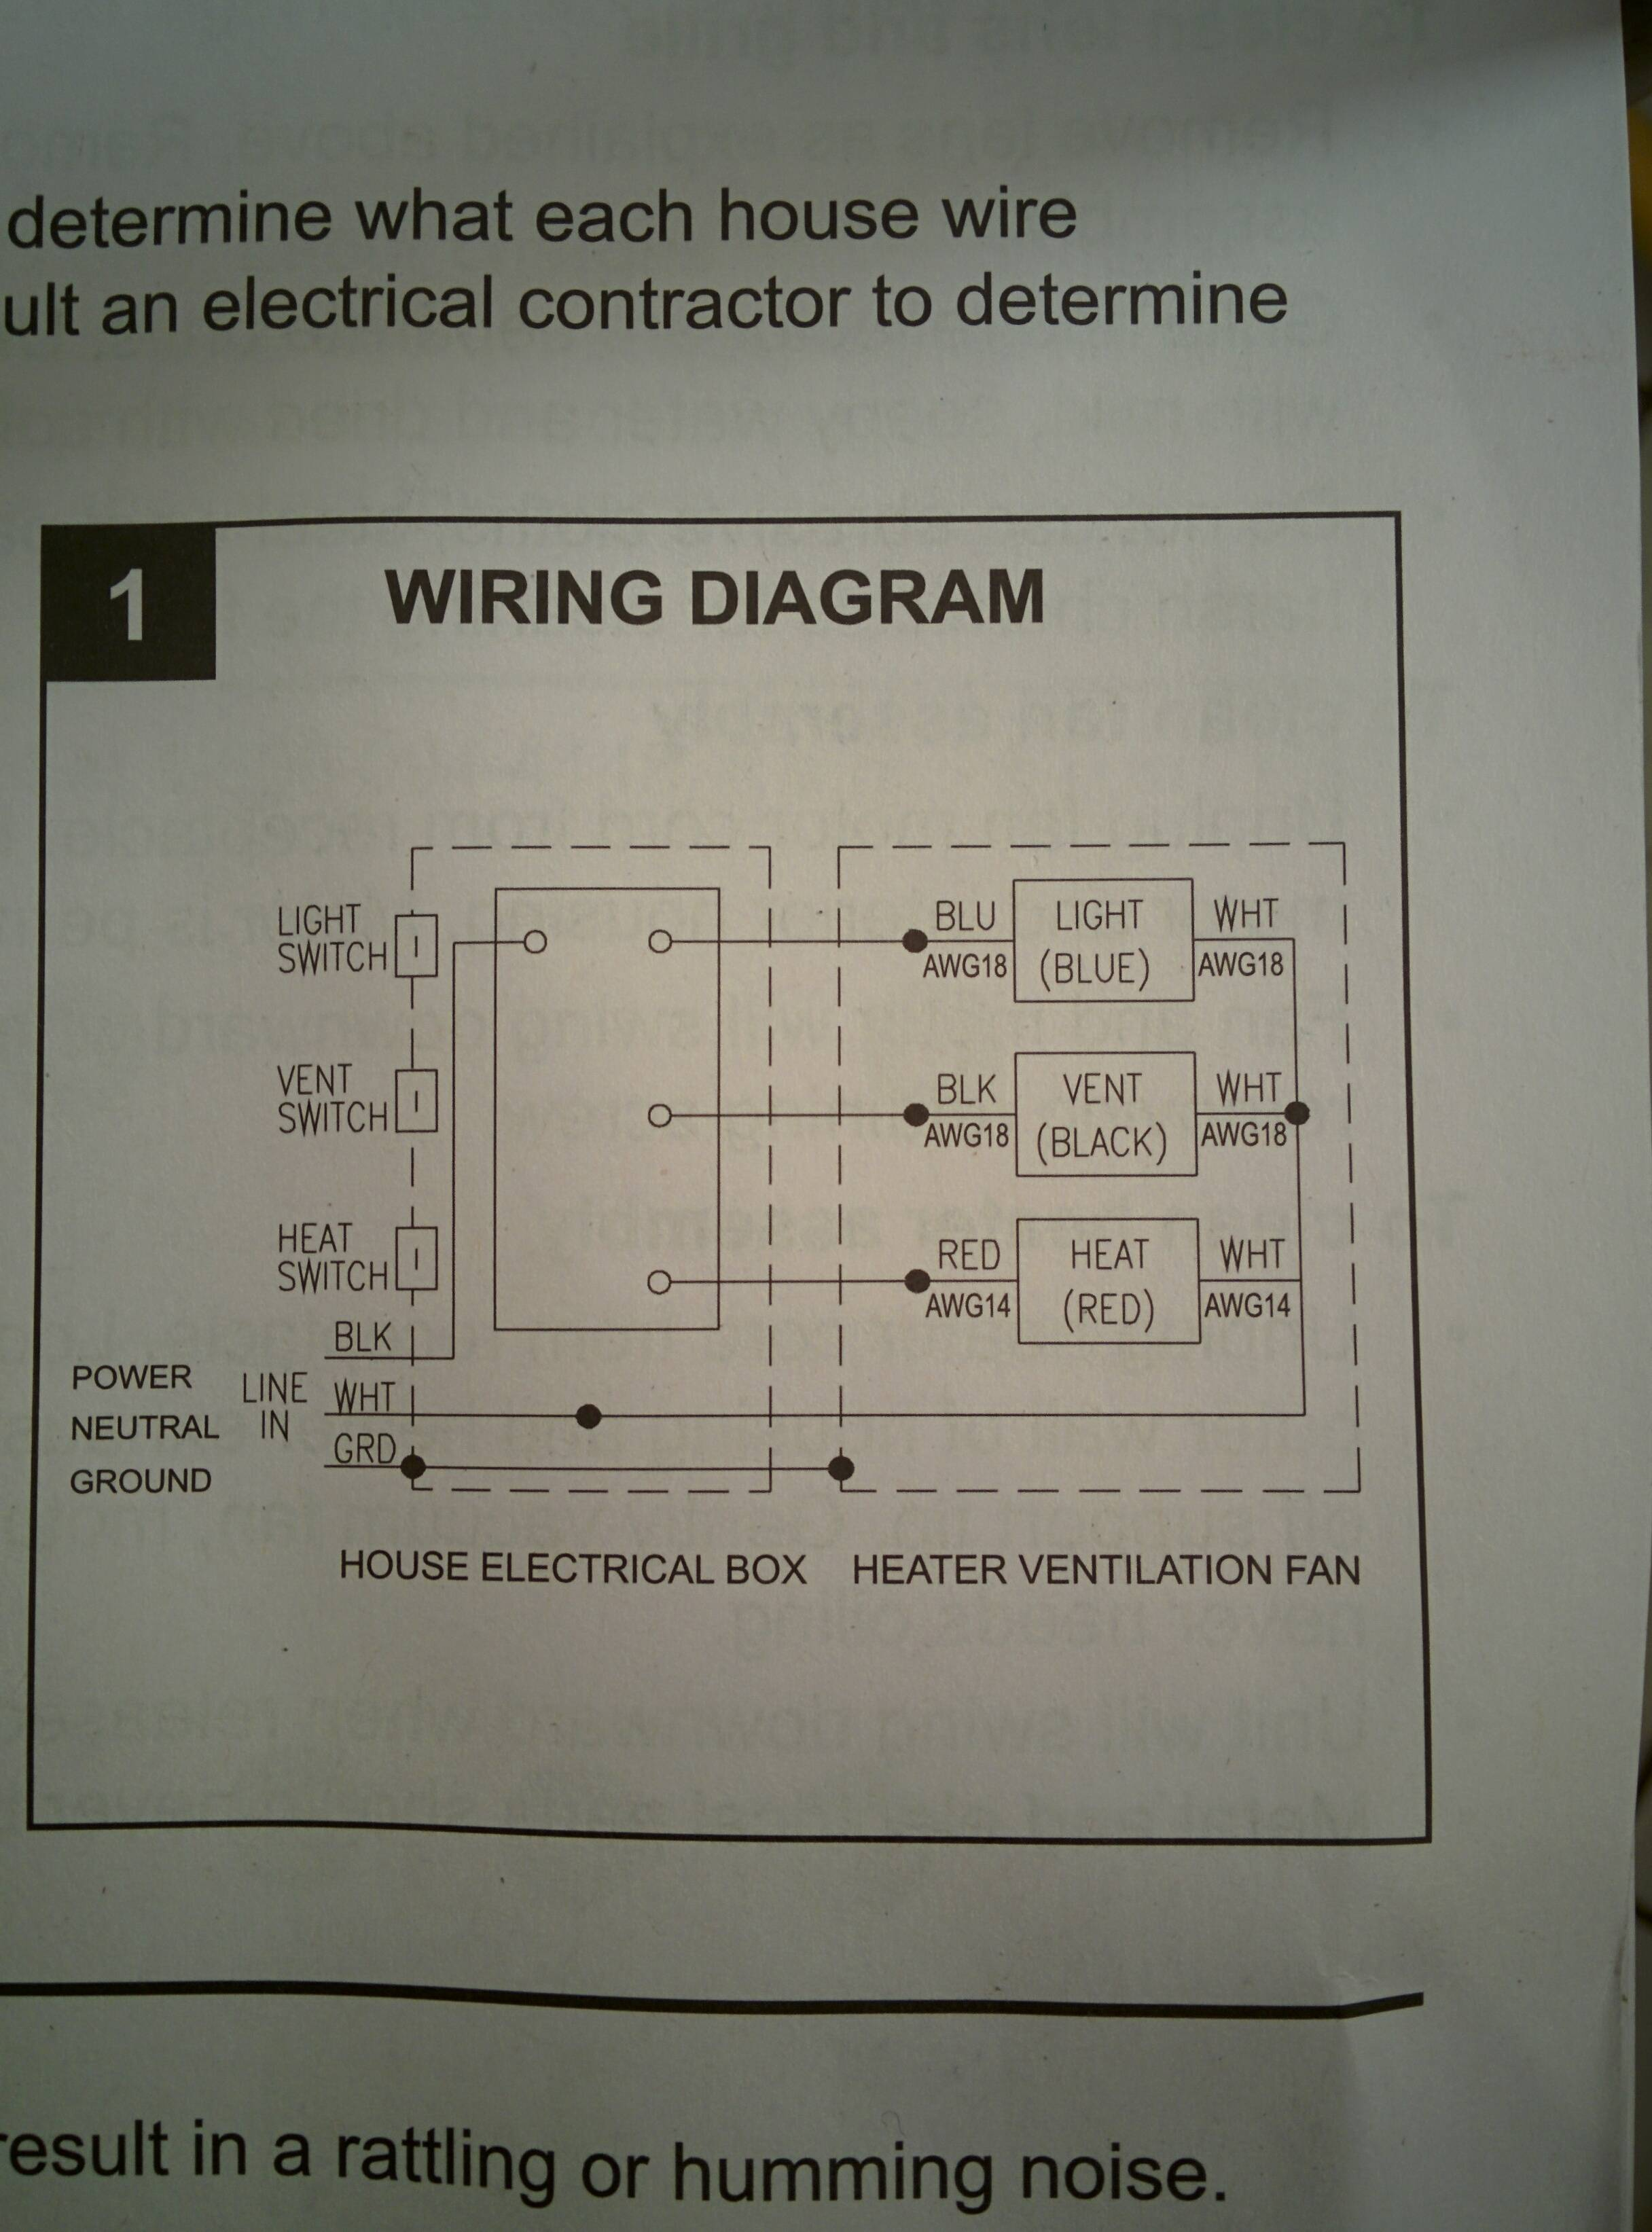 Surprising Wiring Bathroom Fan Heater Carbonvote Mudit Blog Wiring Cloud Rineaidewilluminateatxorg